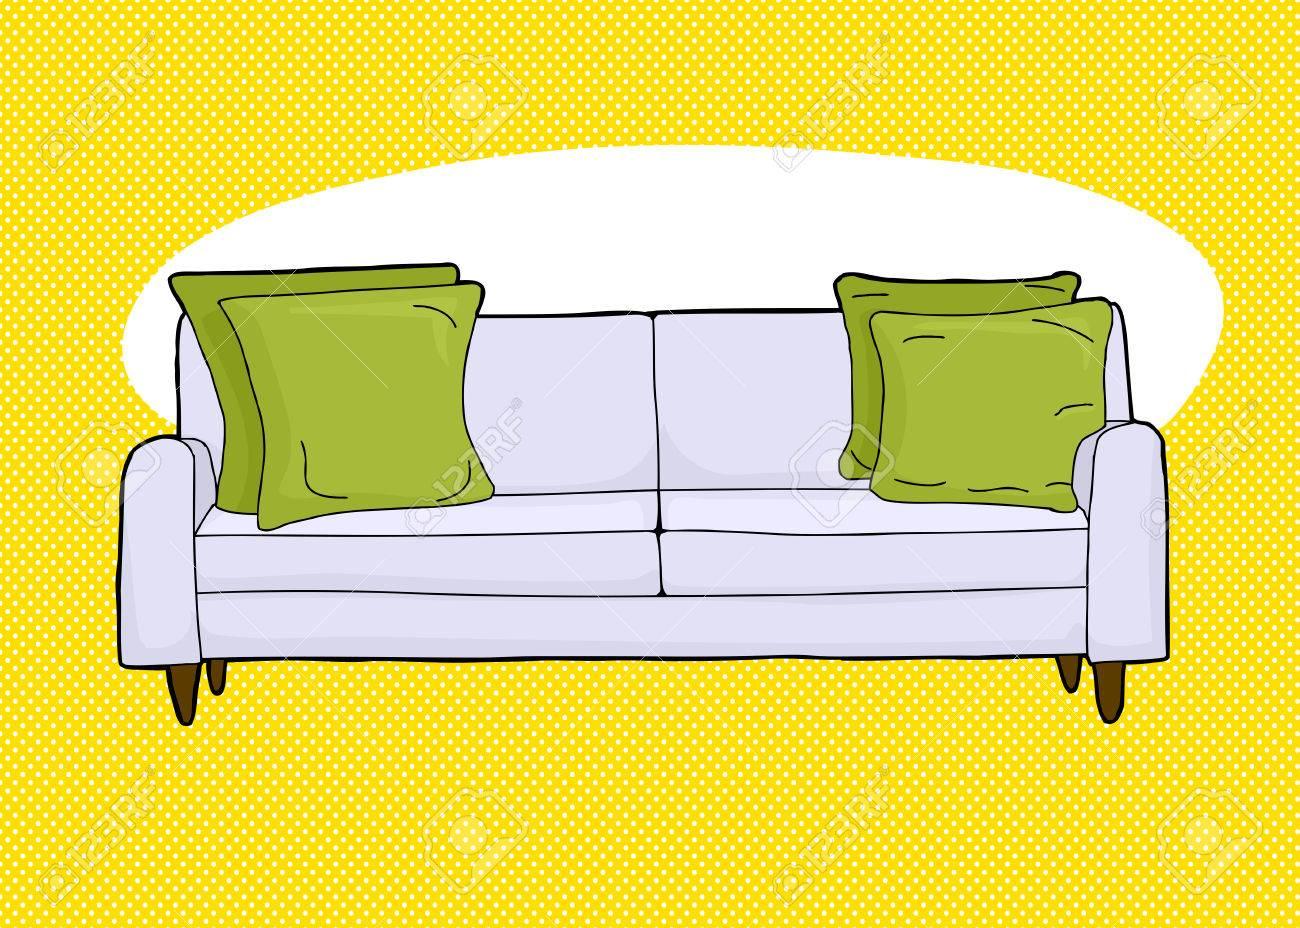 Cartoon Of Single Love Seat Sofa With Corner Cushions Stock Vector    40993284